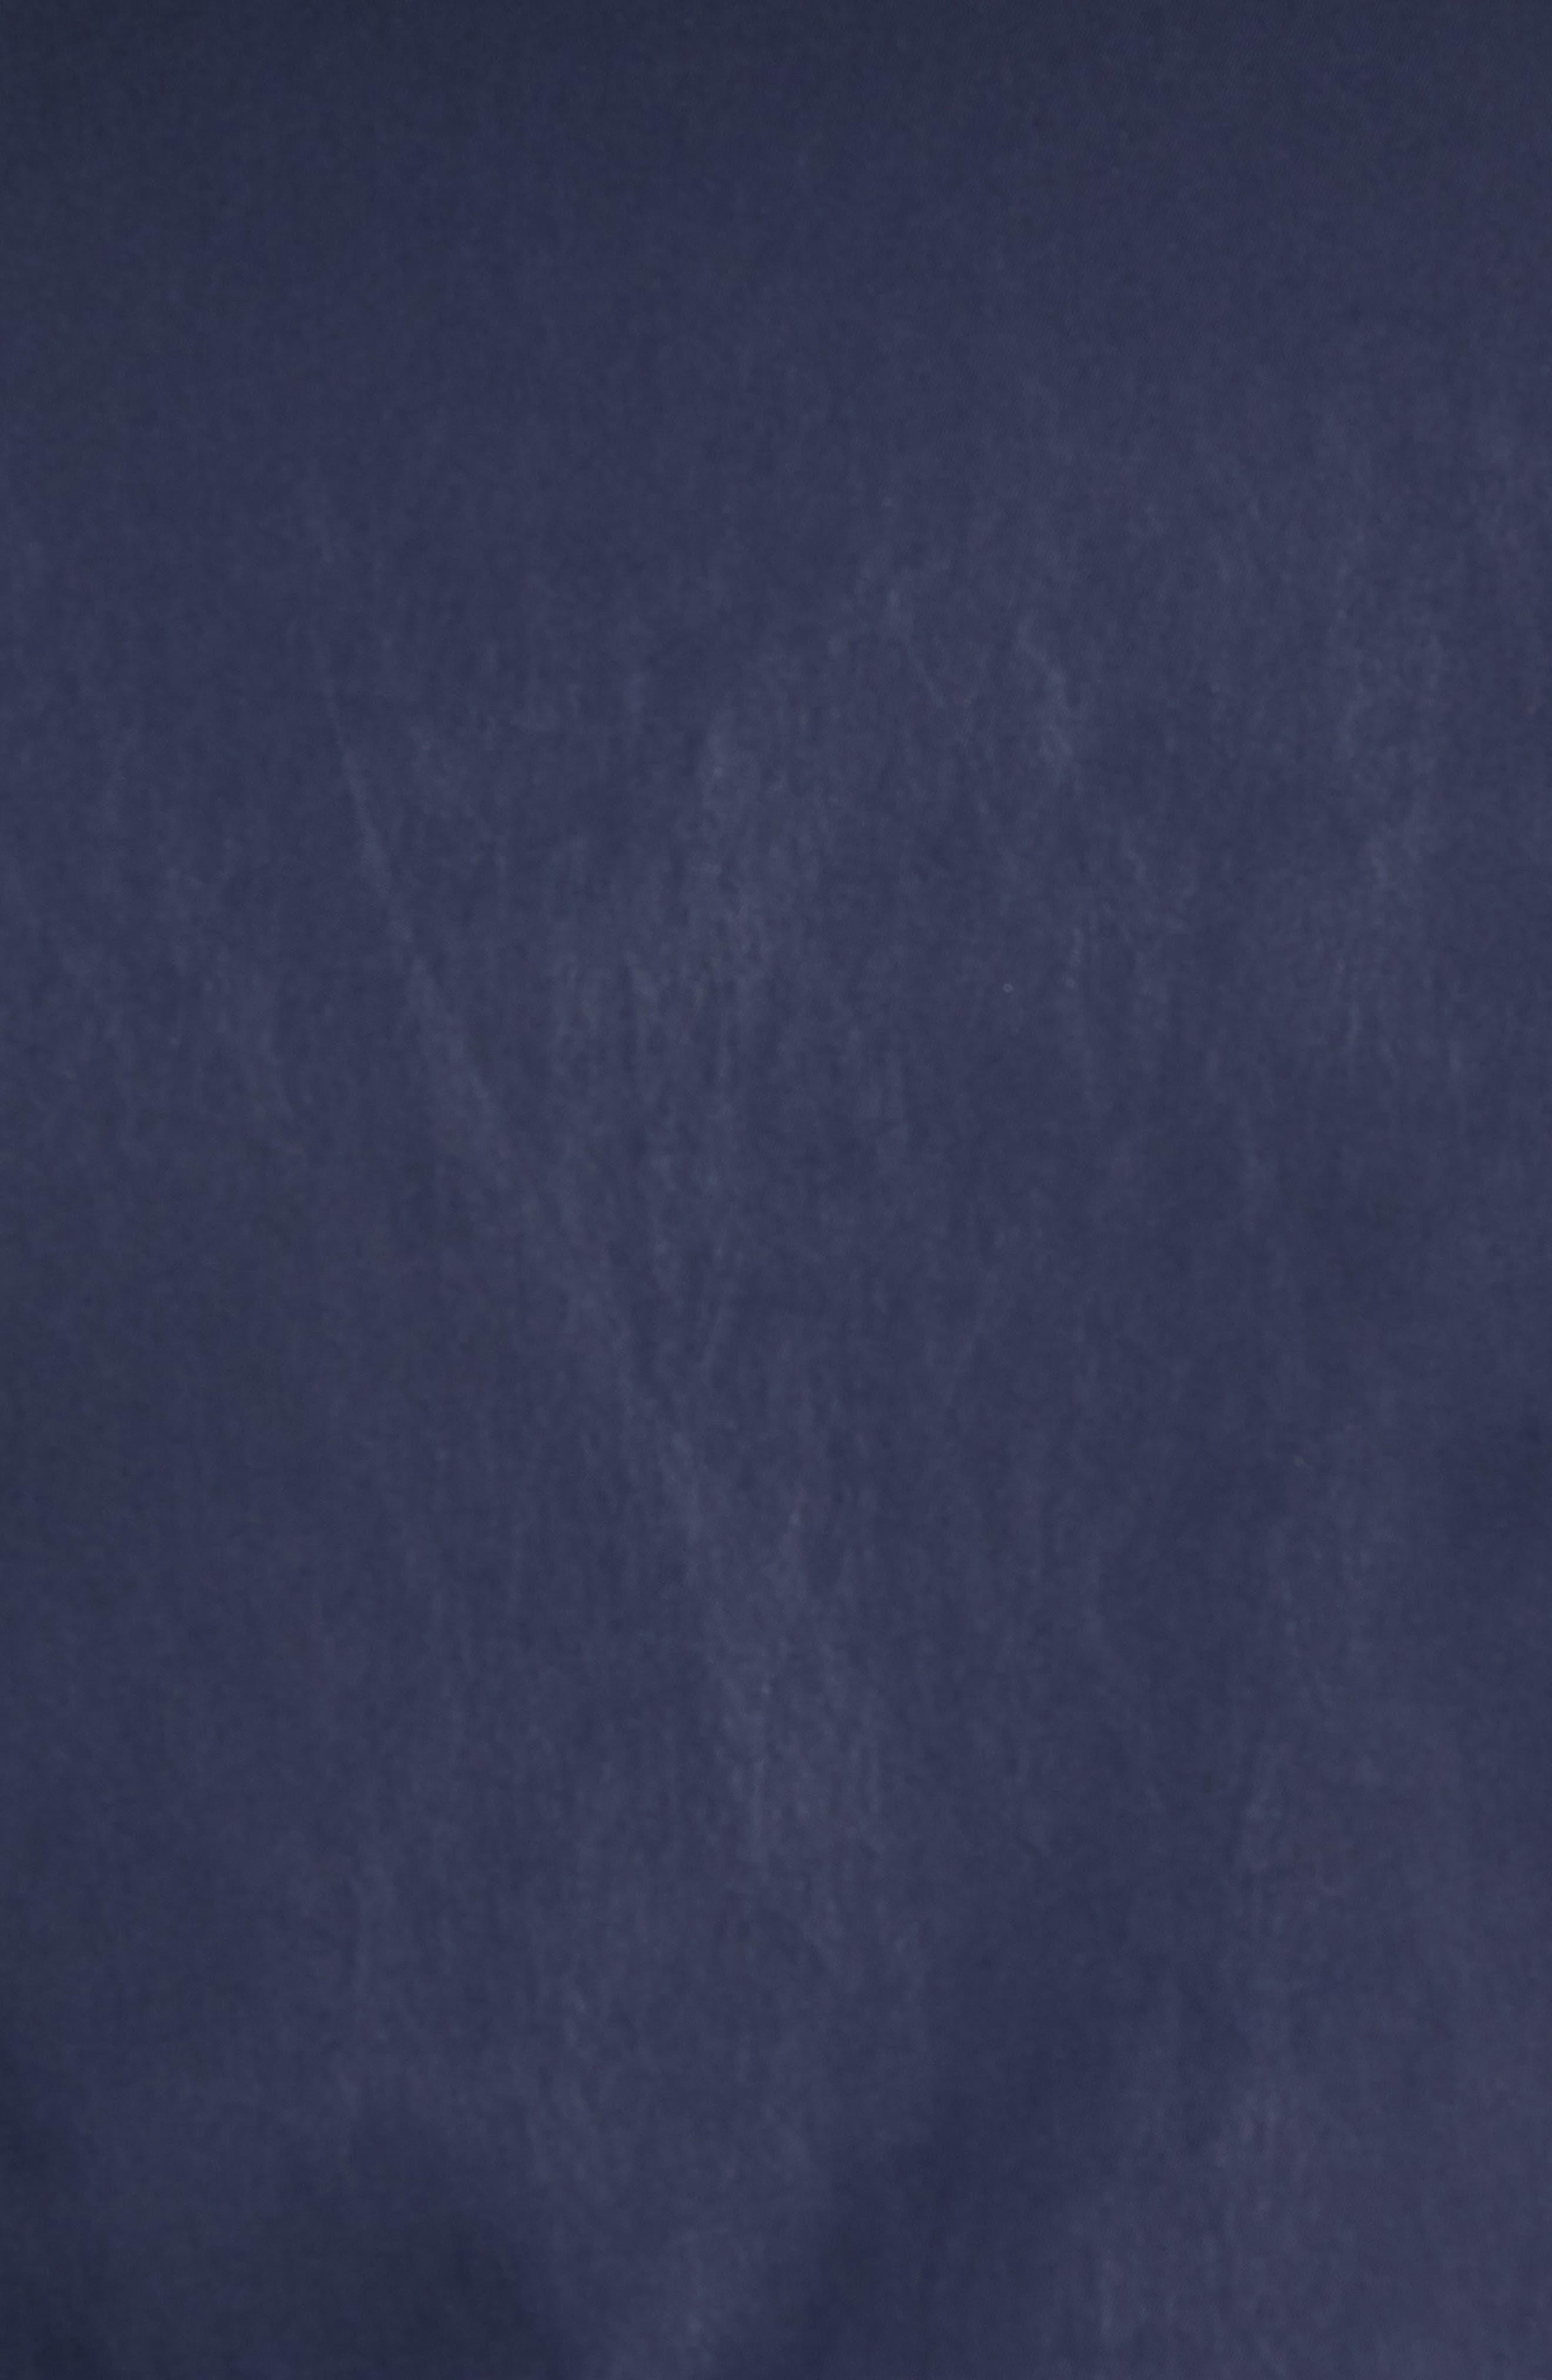 Souvenir Bomber Jacket,                             Alternate thumbnail 6, color,                             400